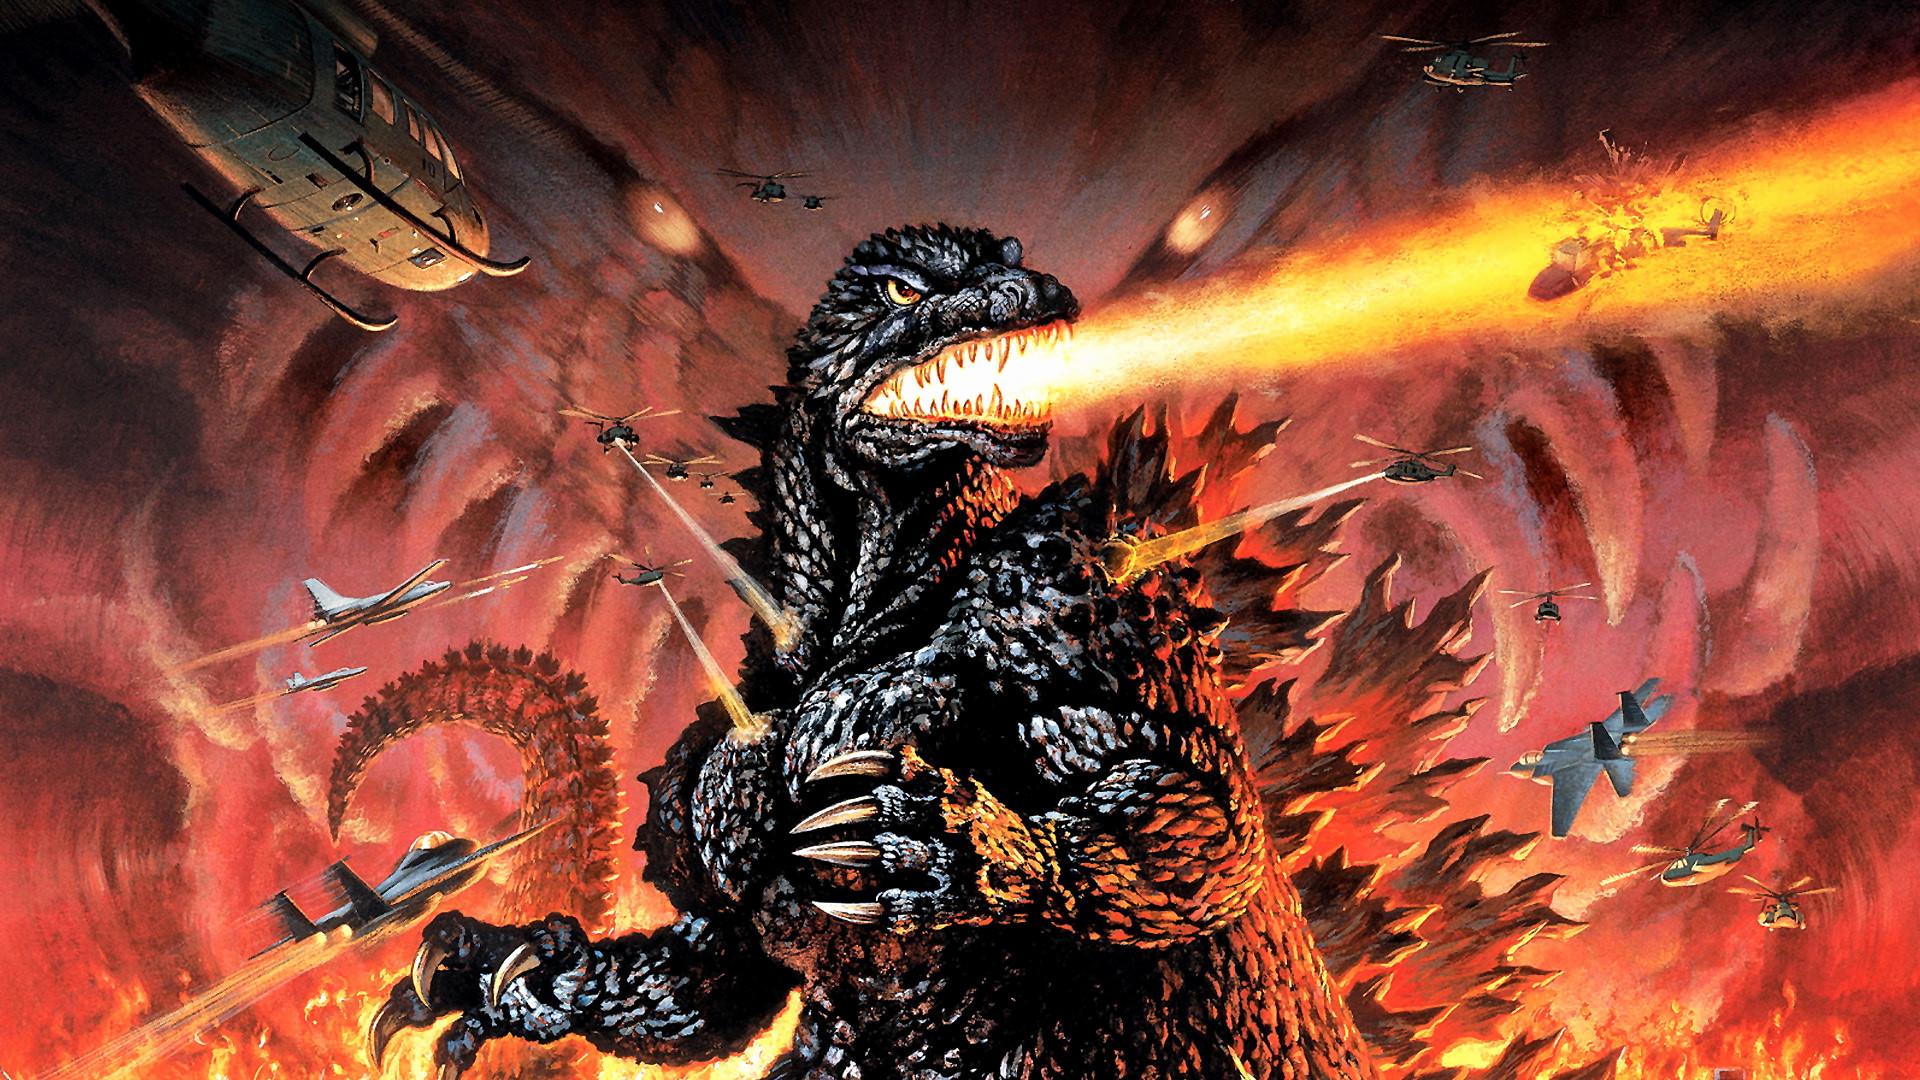 Res: 1920x1080, Godzilla Wallpaper Lovely Godzilla Wallpaper Px Hdwallsource